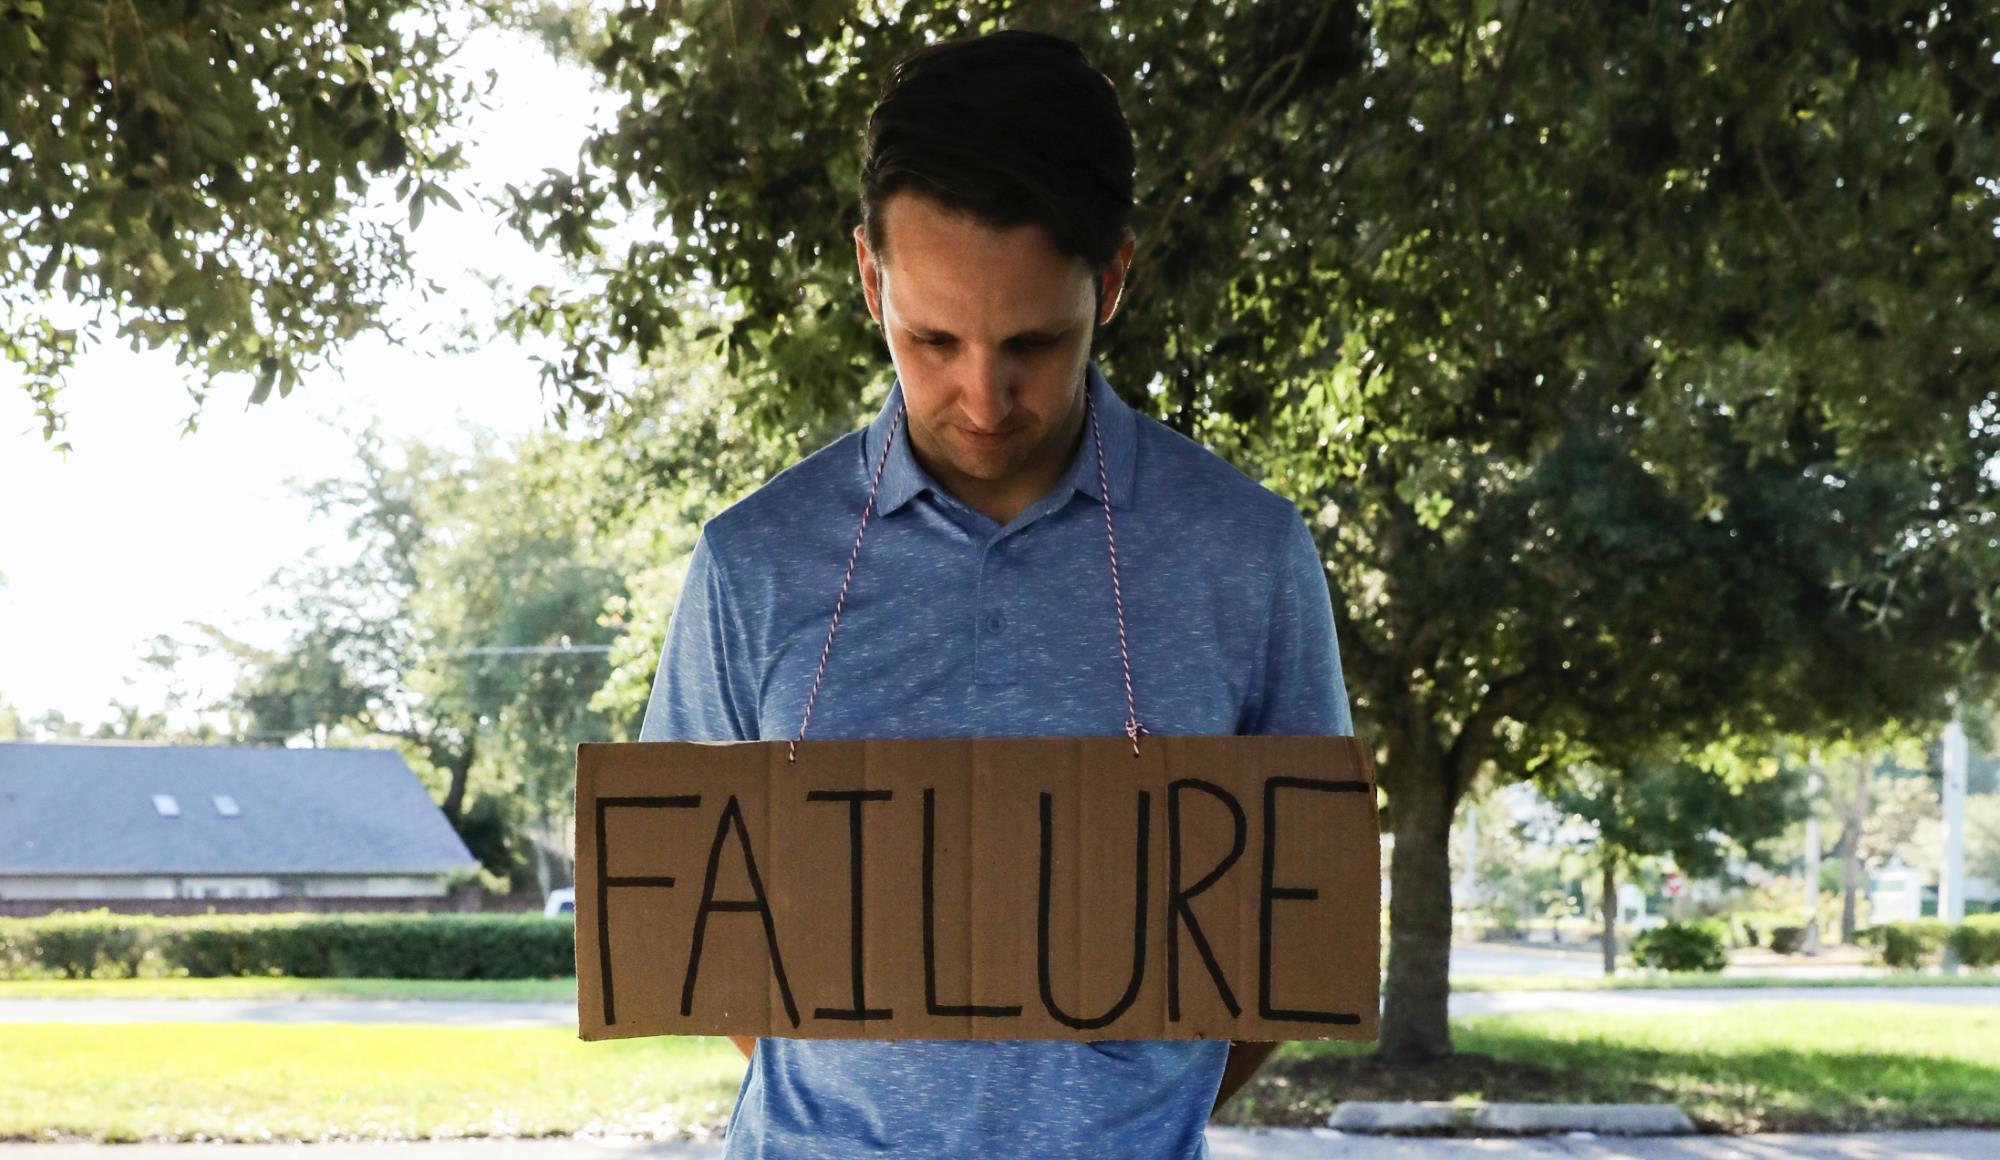 7 Scientific hacks to build self-confidence | Inge Rock